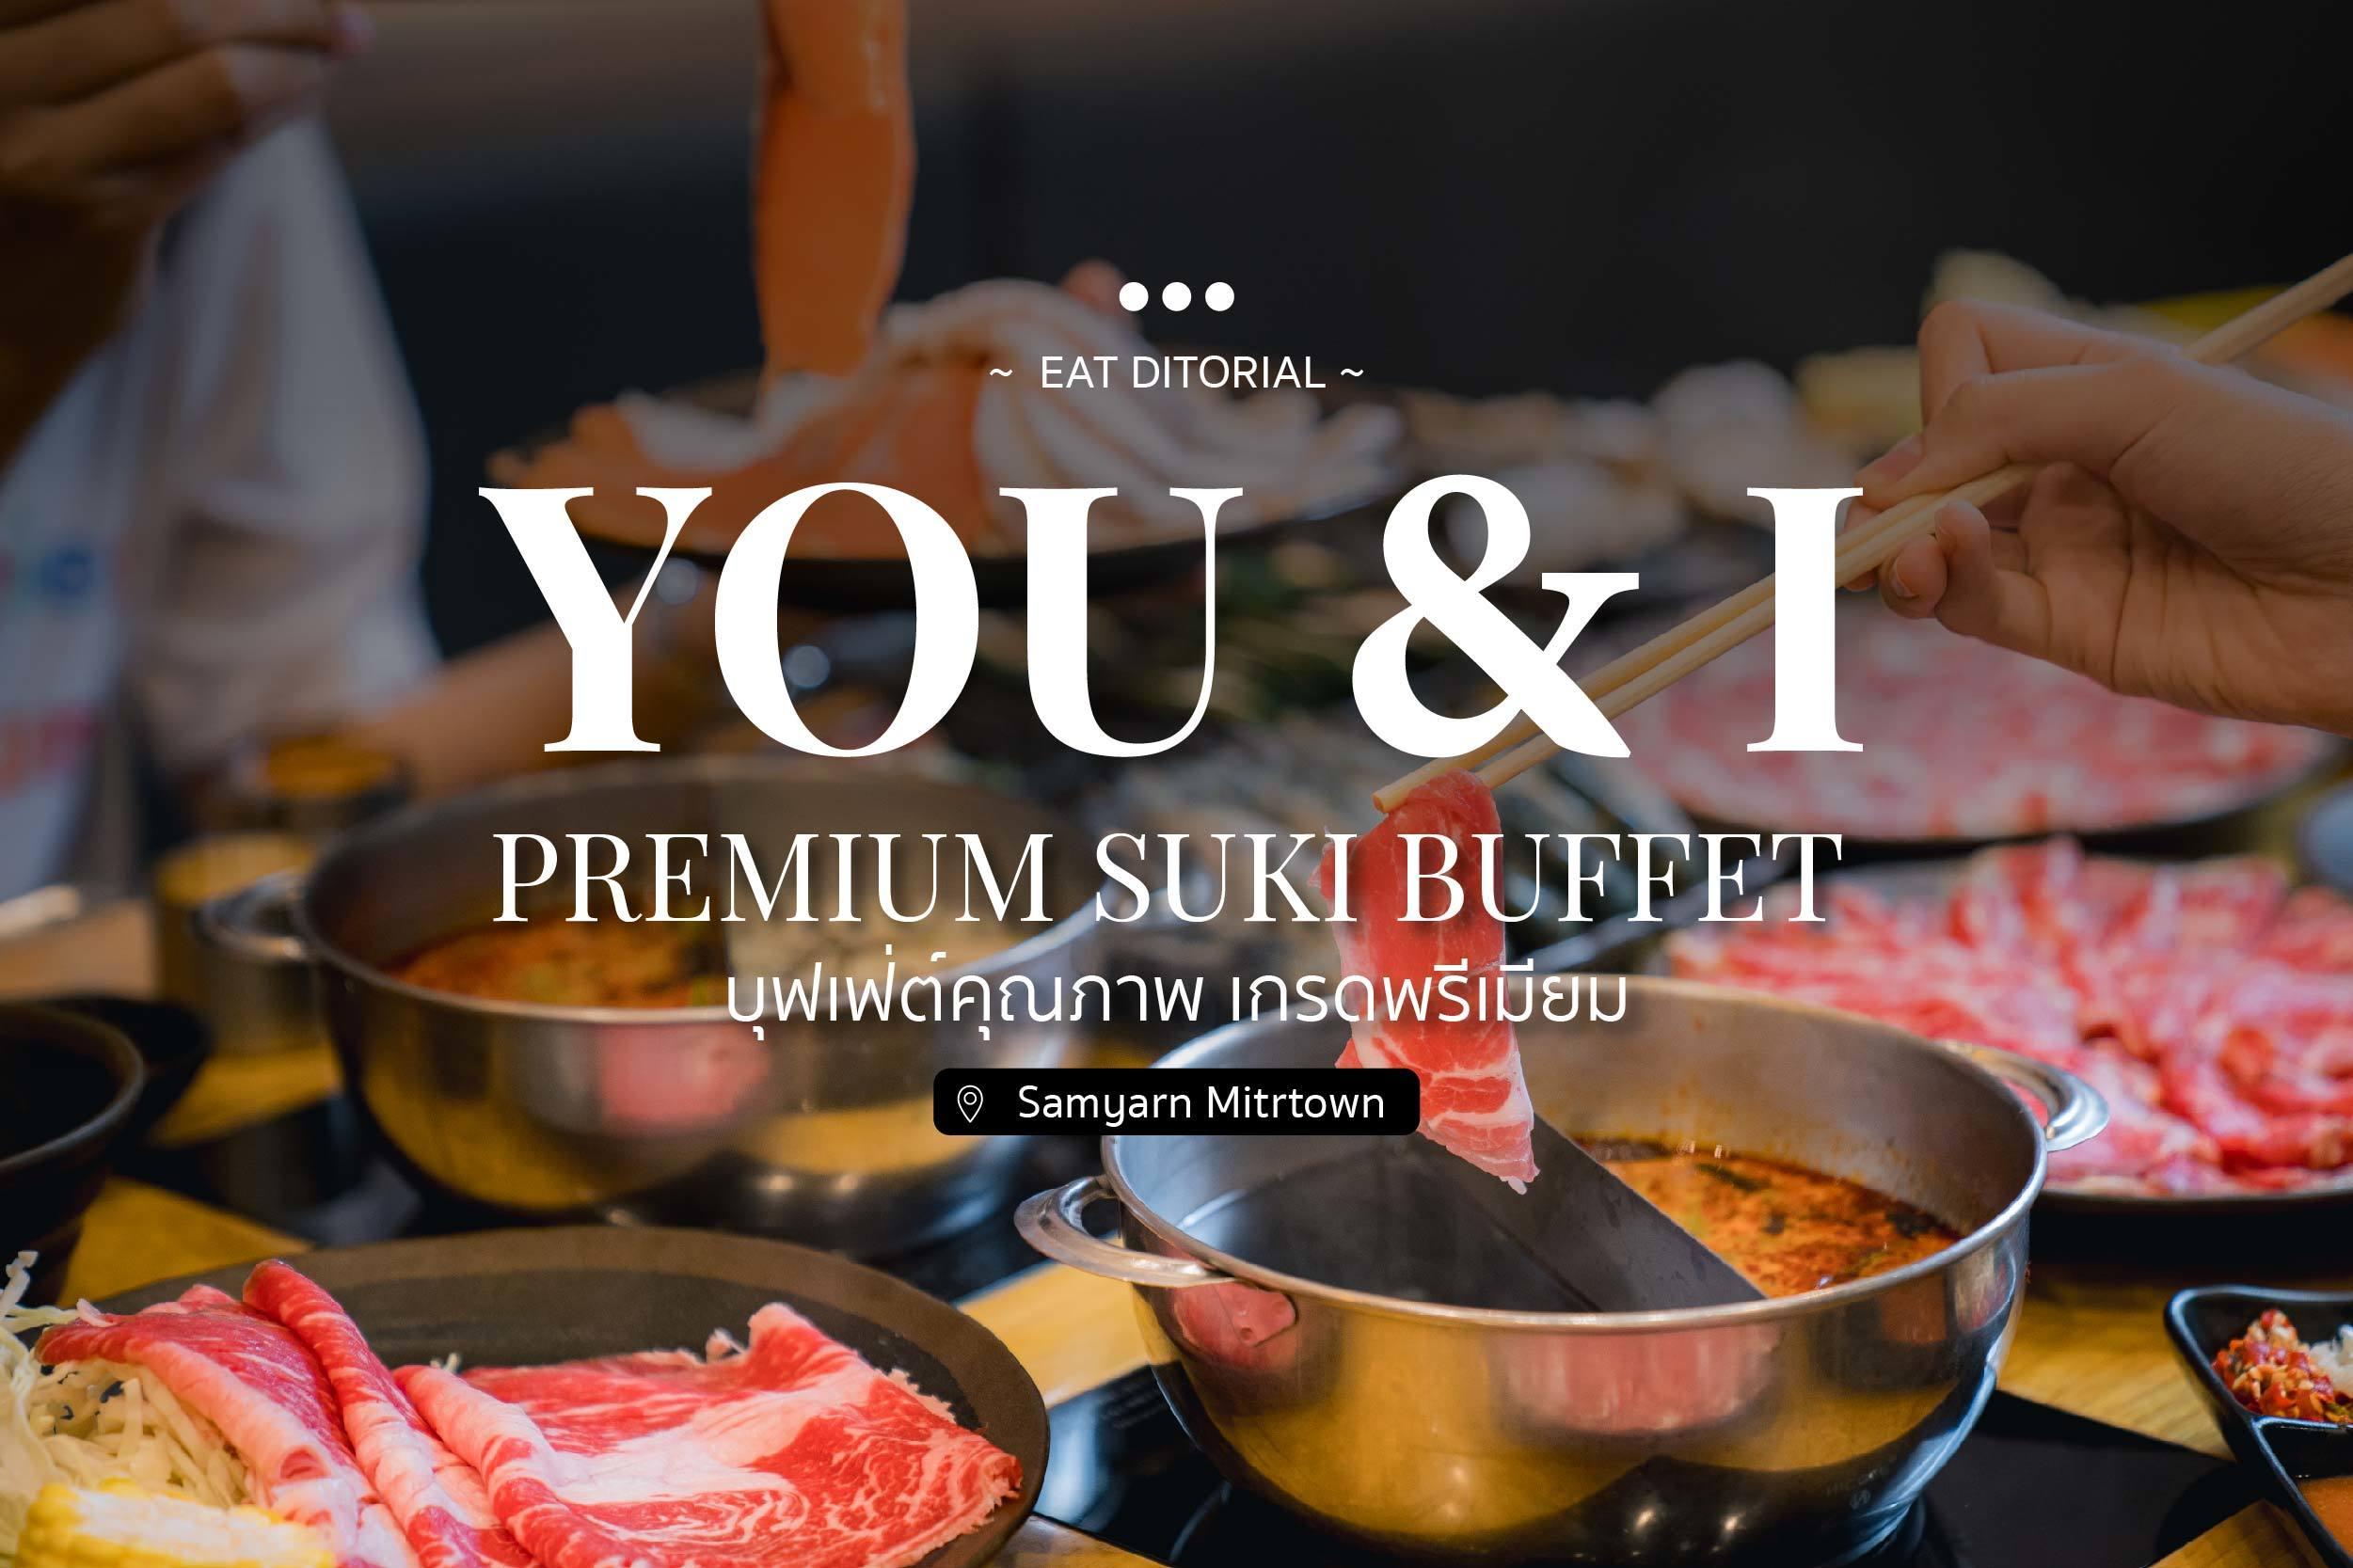 You I premium suki buffet ปกweb